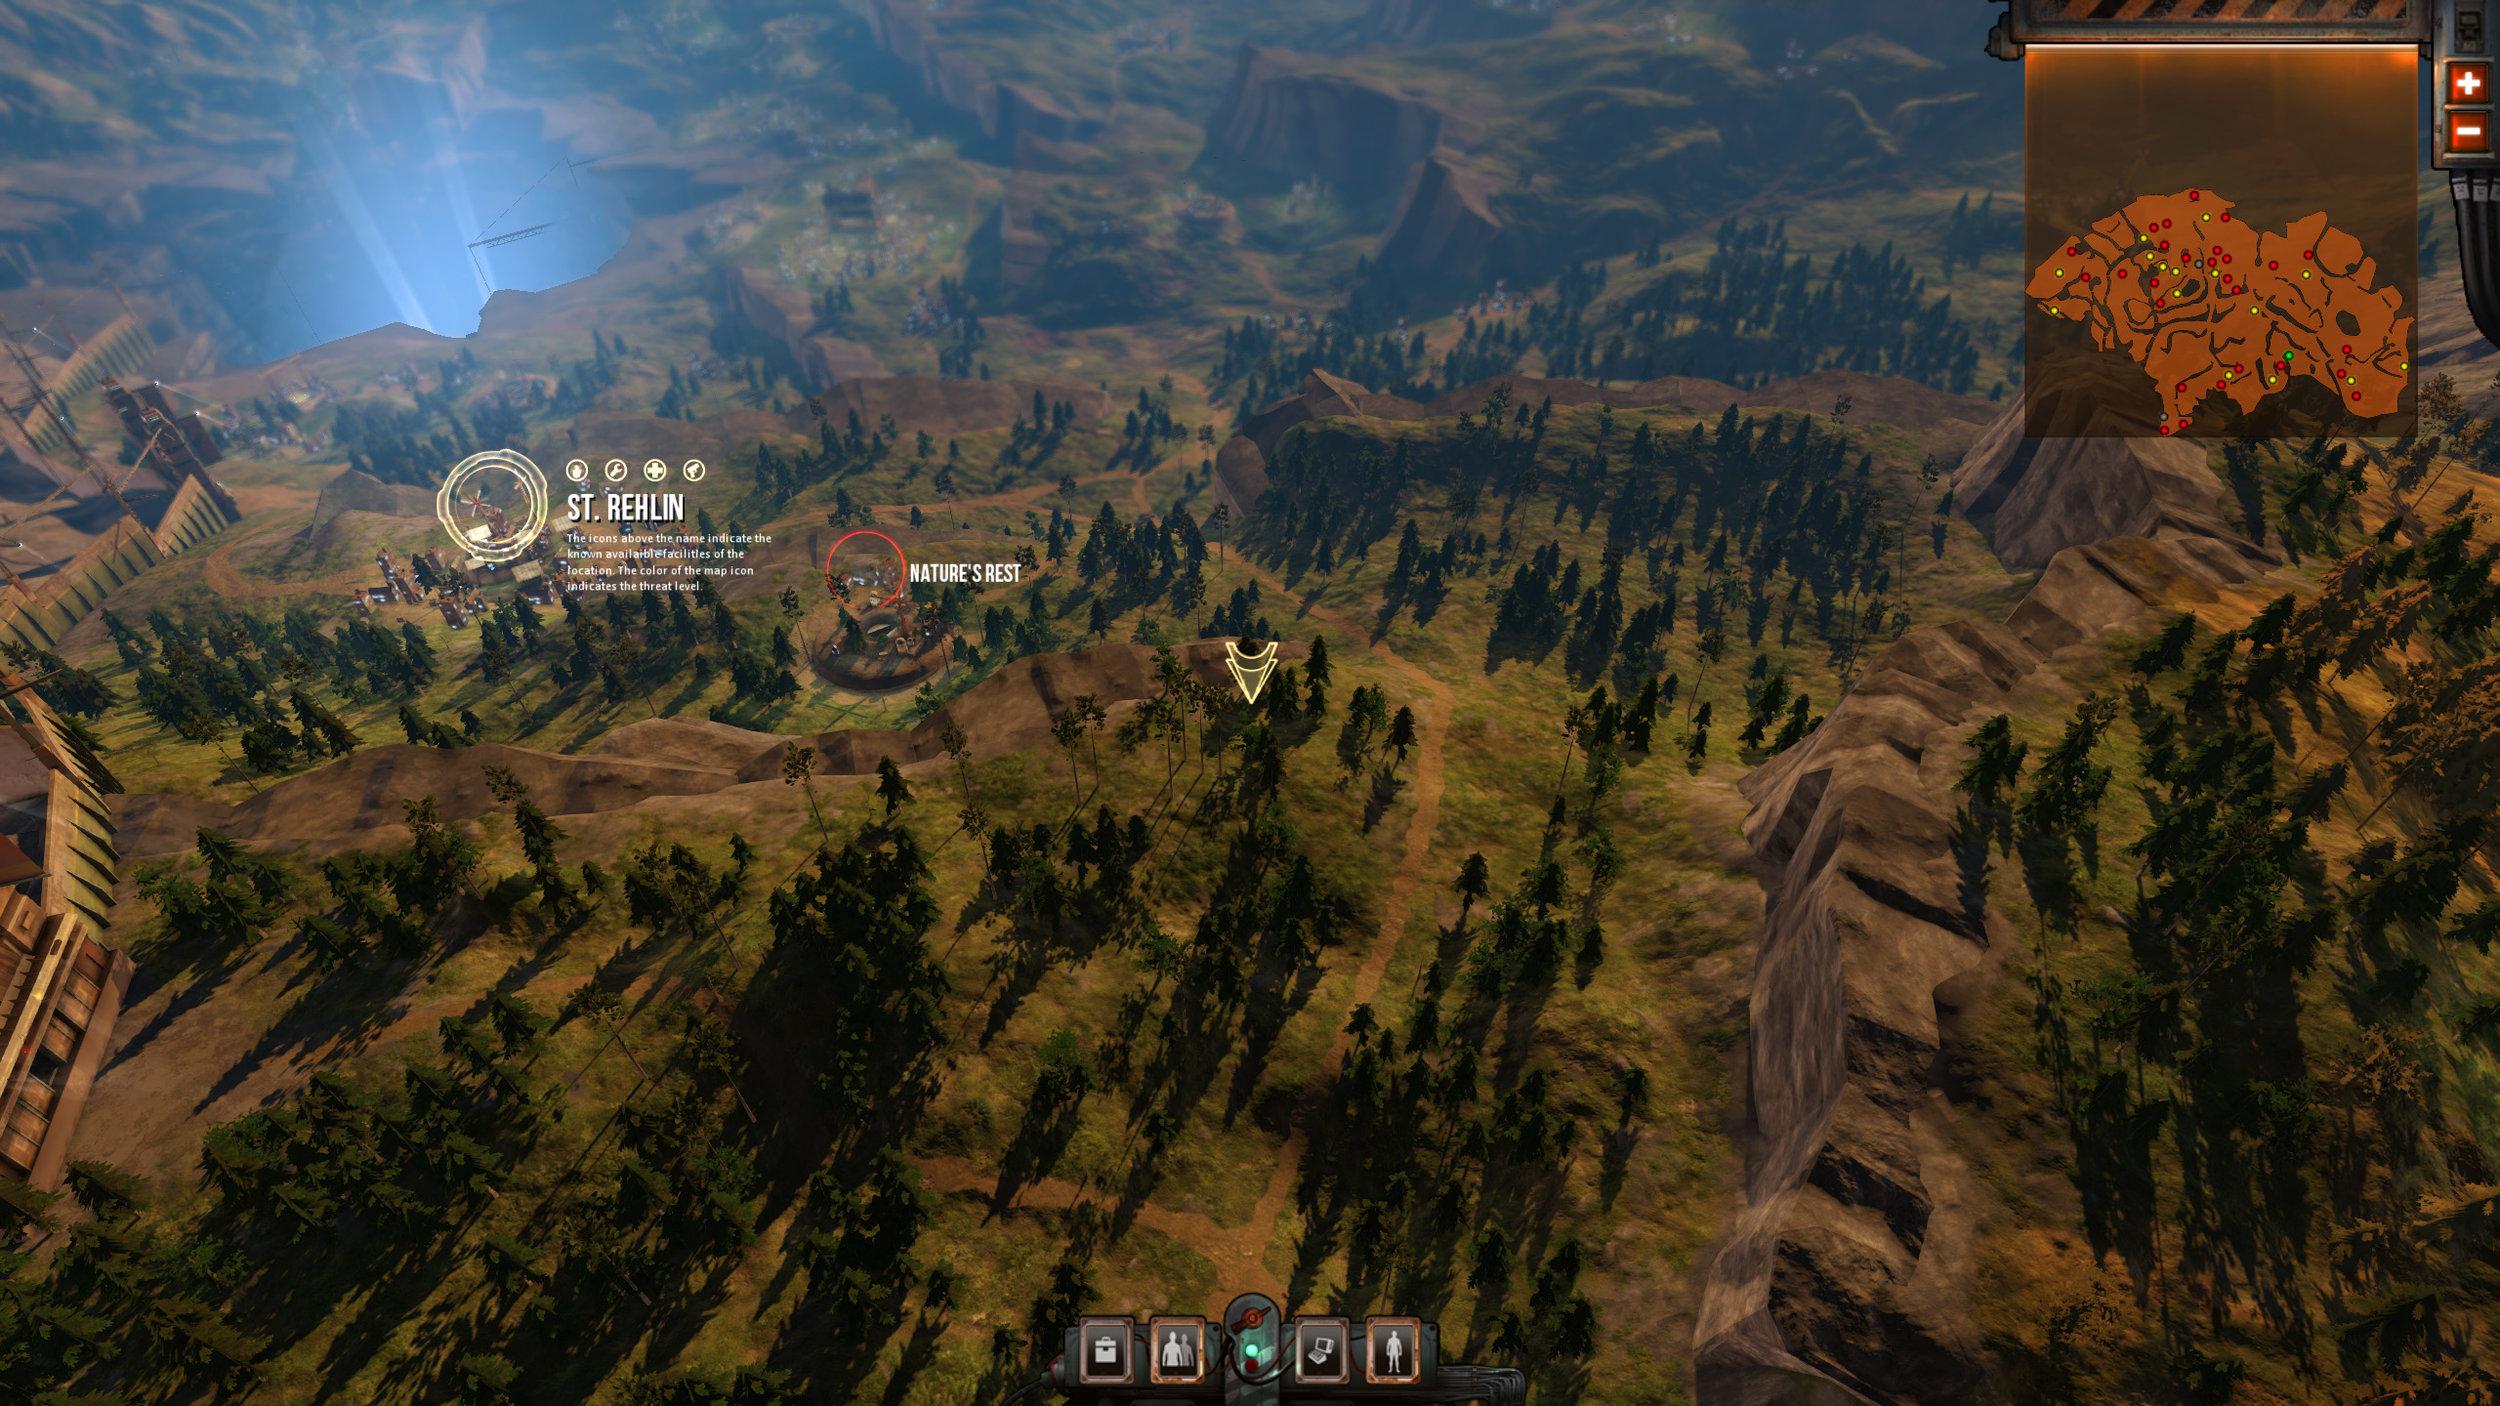 Krater Shadows over Solside Screenshot 14.jpg